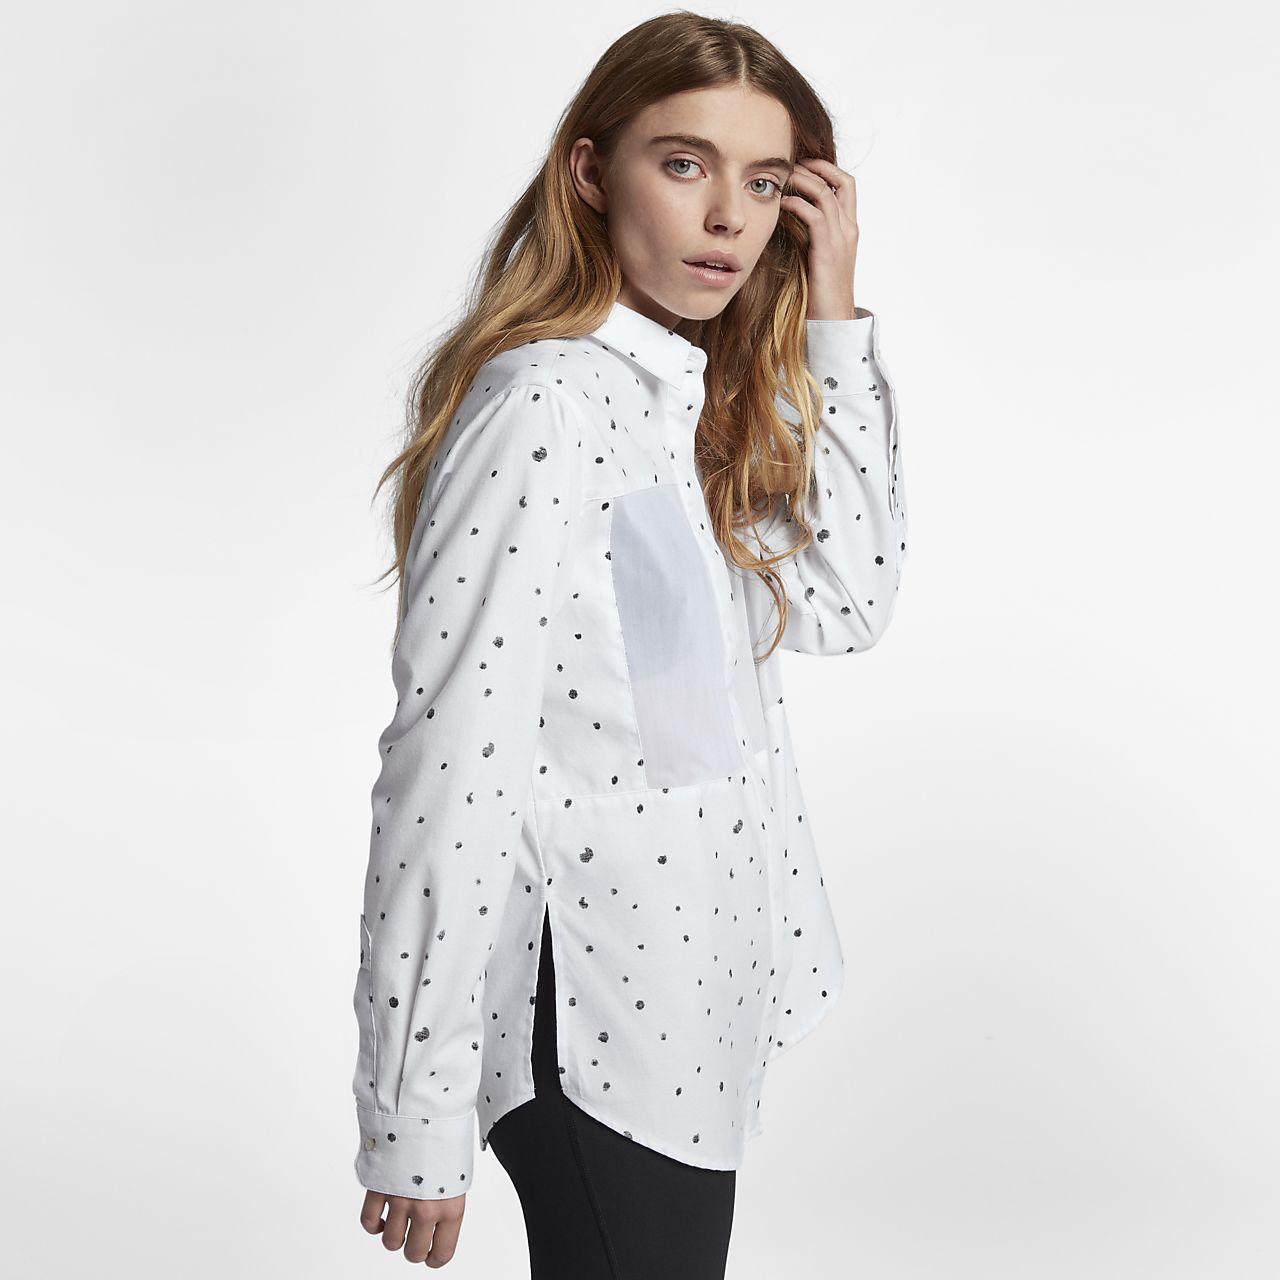 ... Hurley Wilson Mesh Dot Women's Long Sleeve Shirt